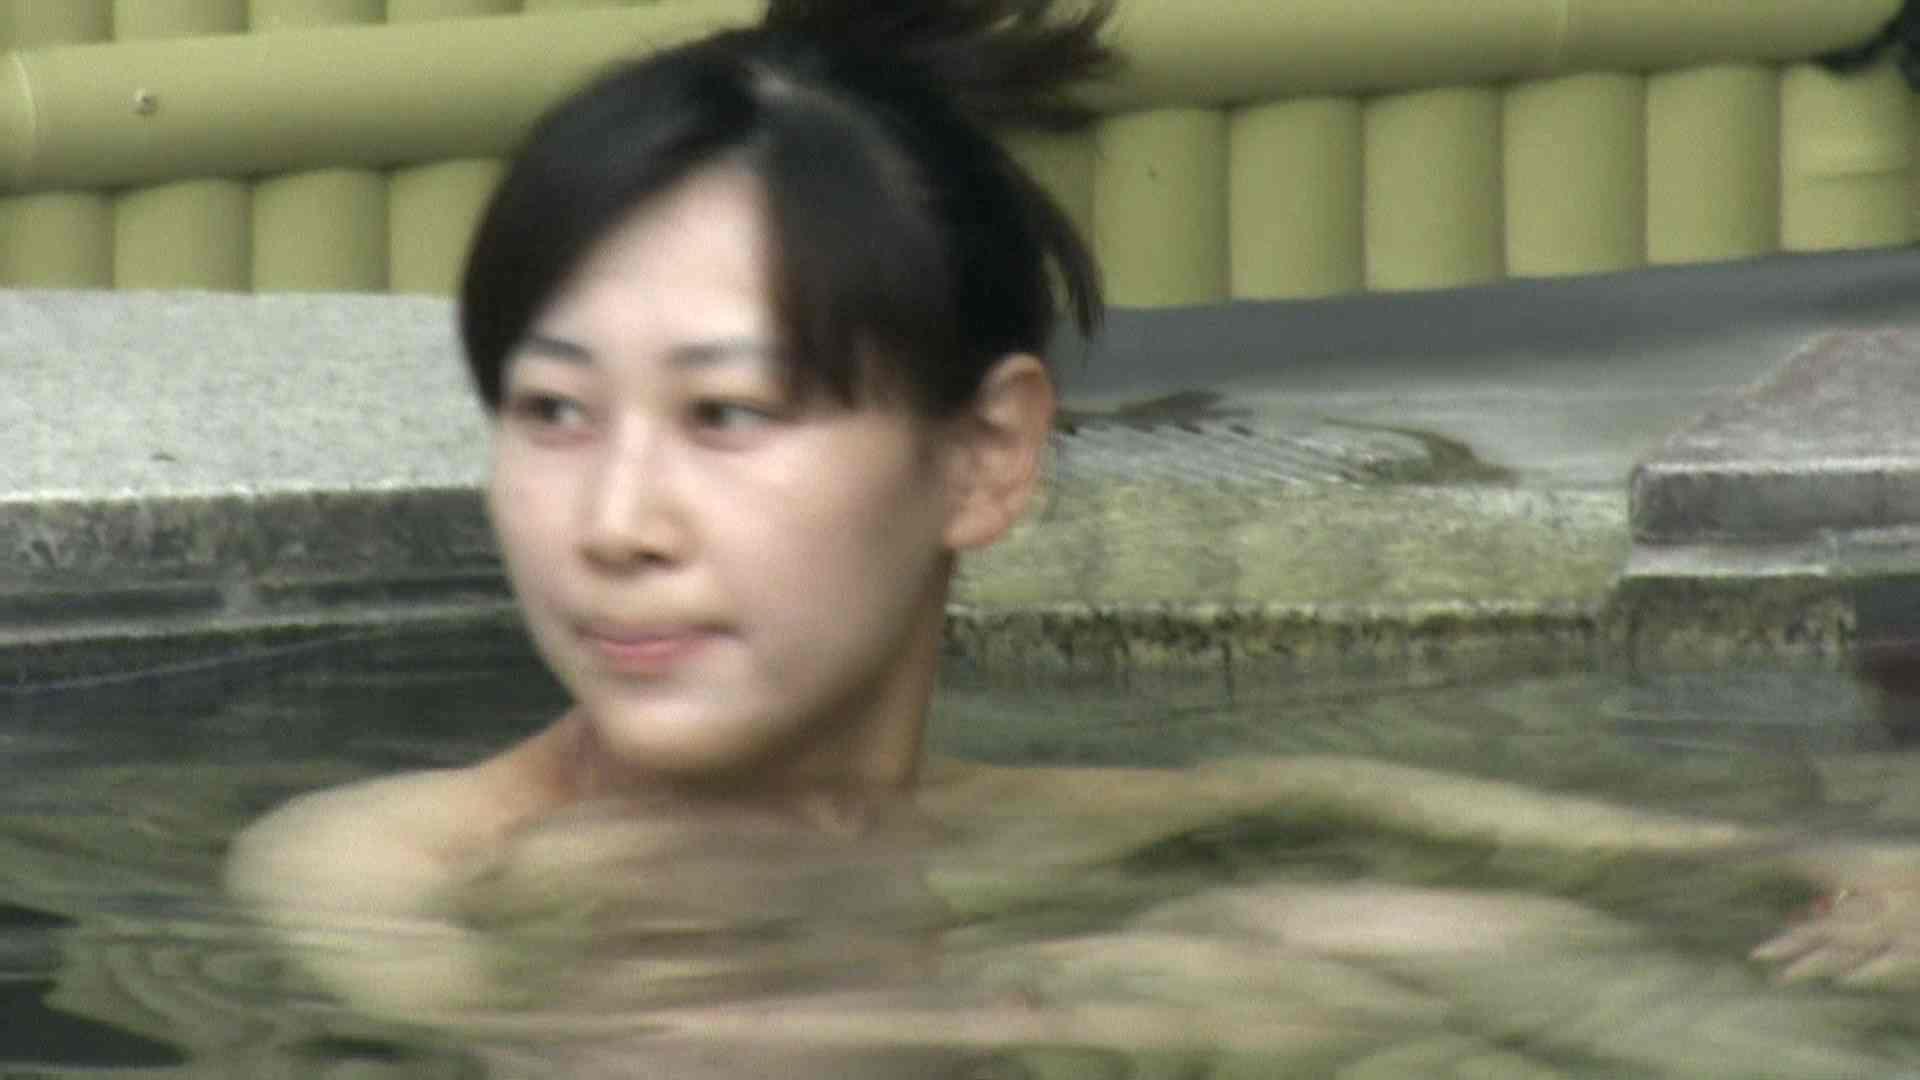 Aquaな露天風呂Vol.665 HなOL   盗撮  104pic 50